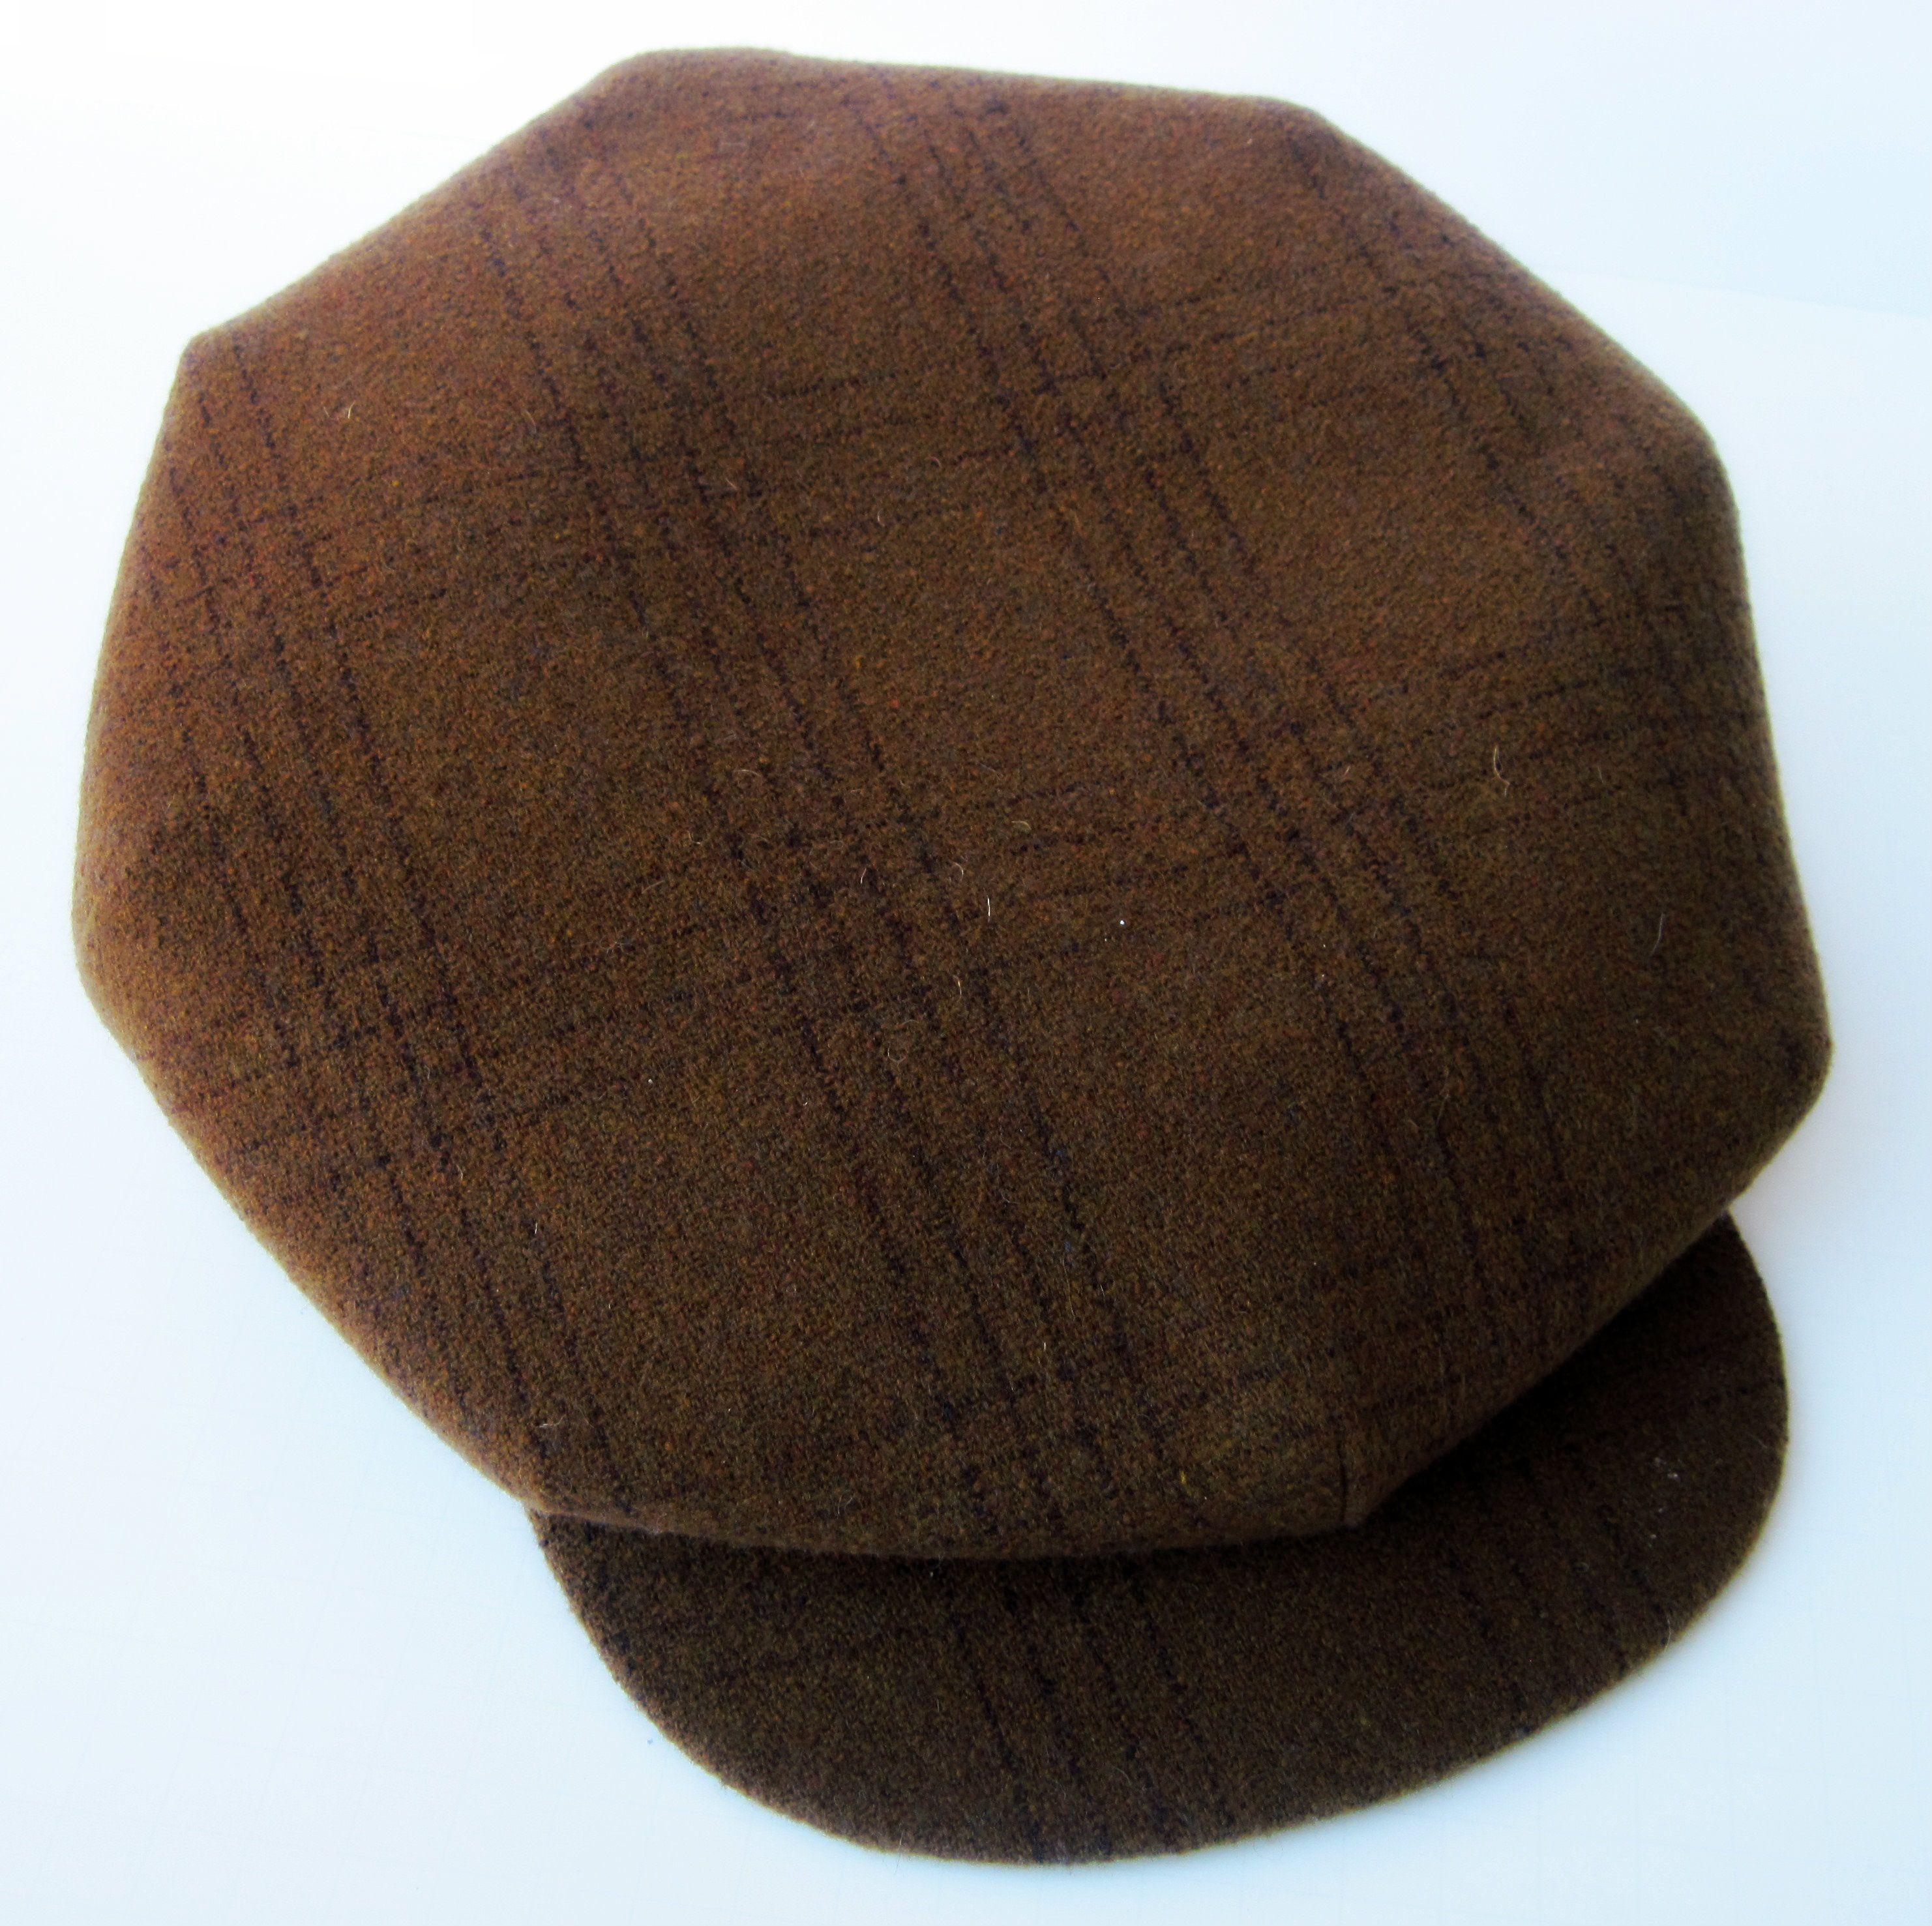 1920 s style cap by Barry Simonds  543dbc19e64